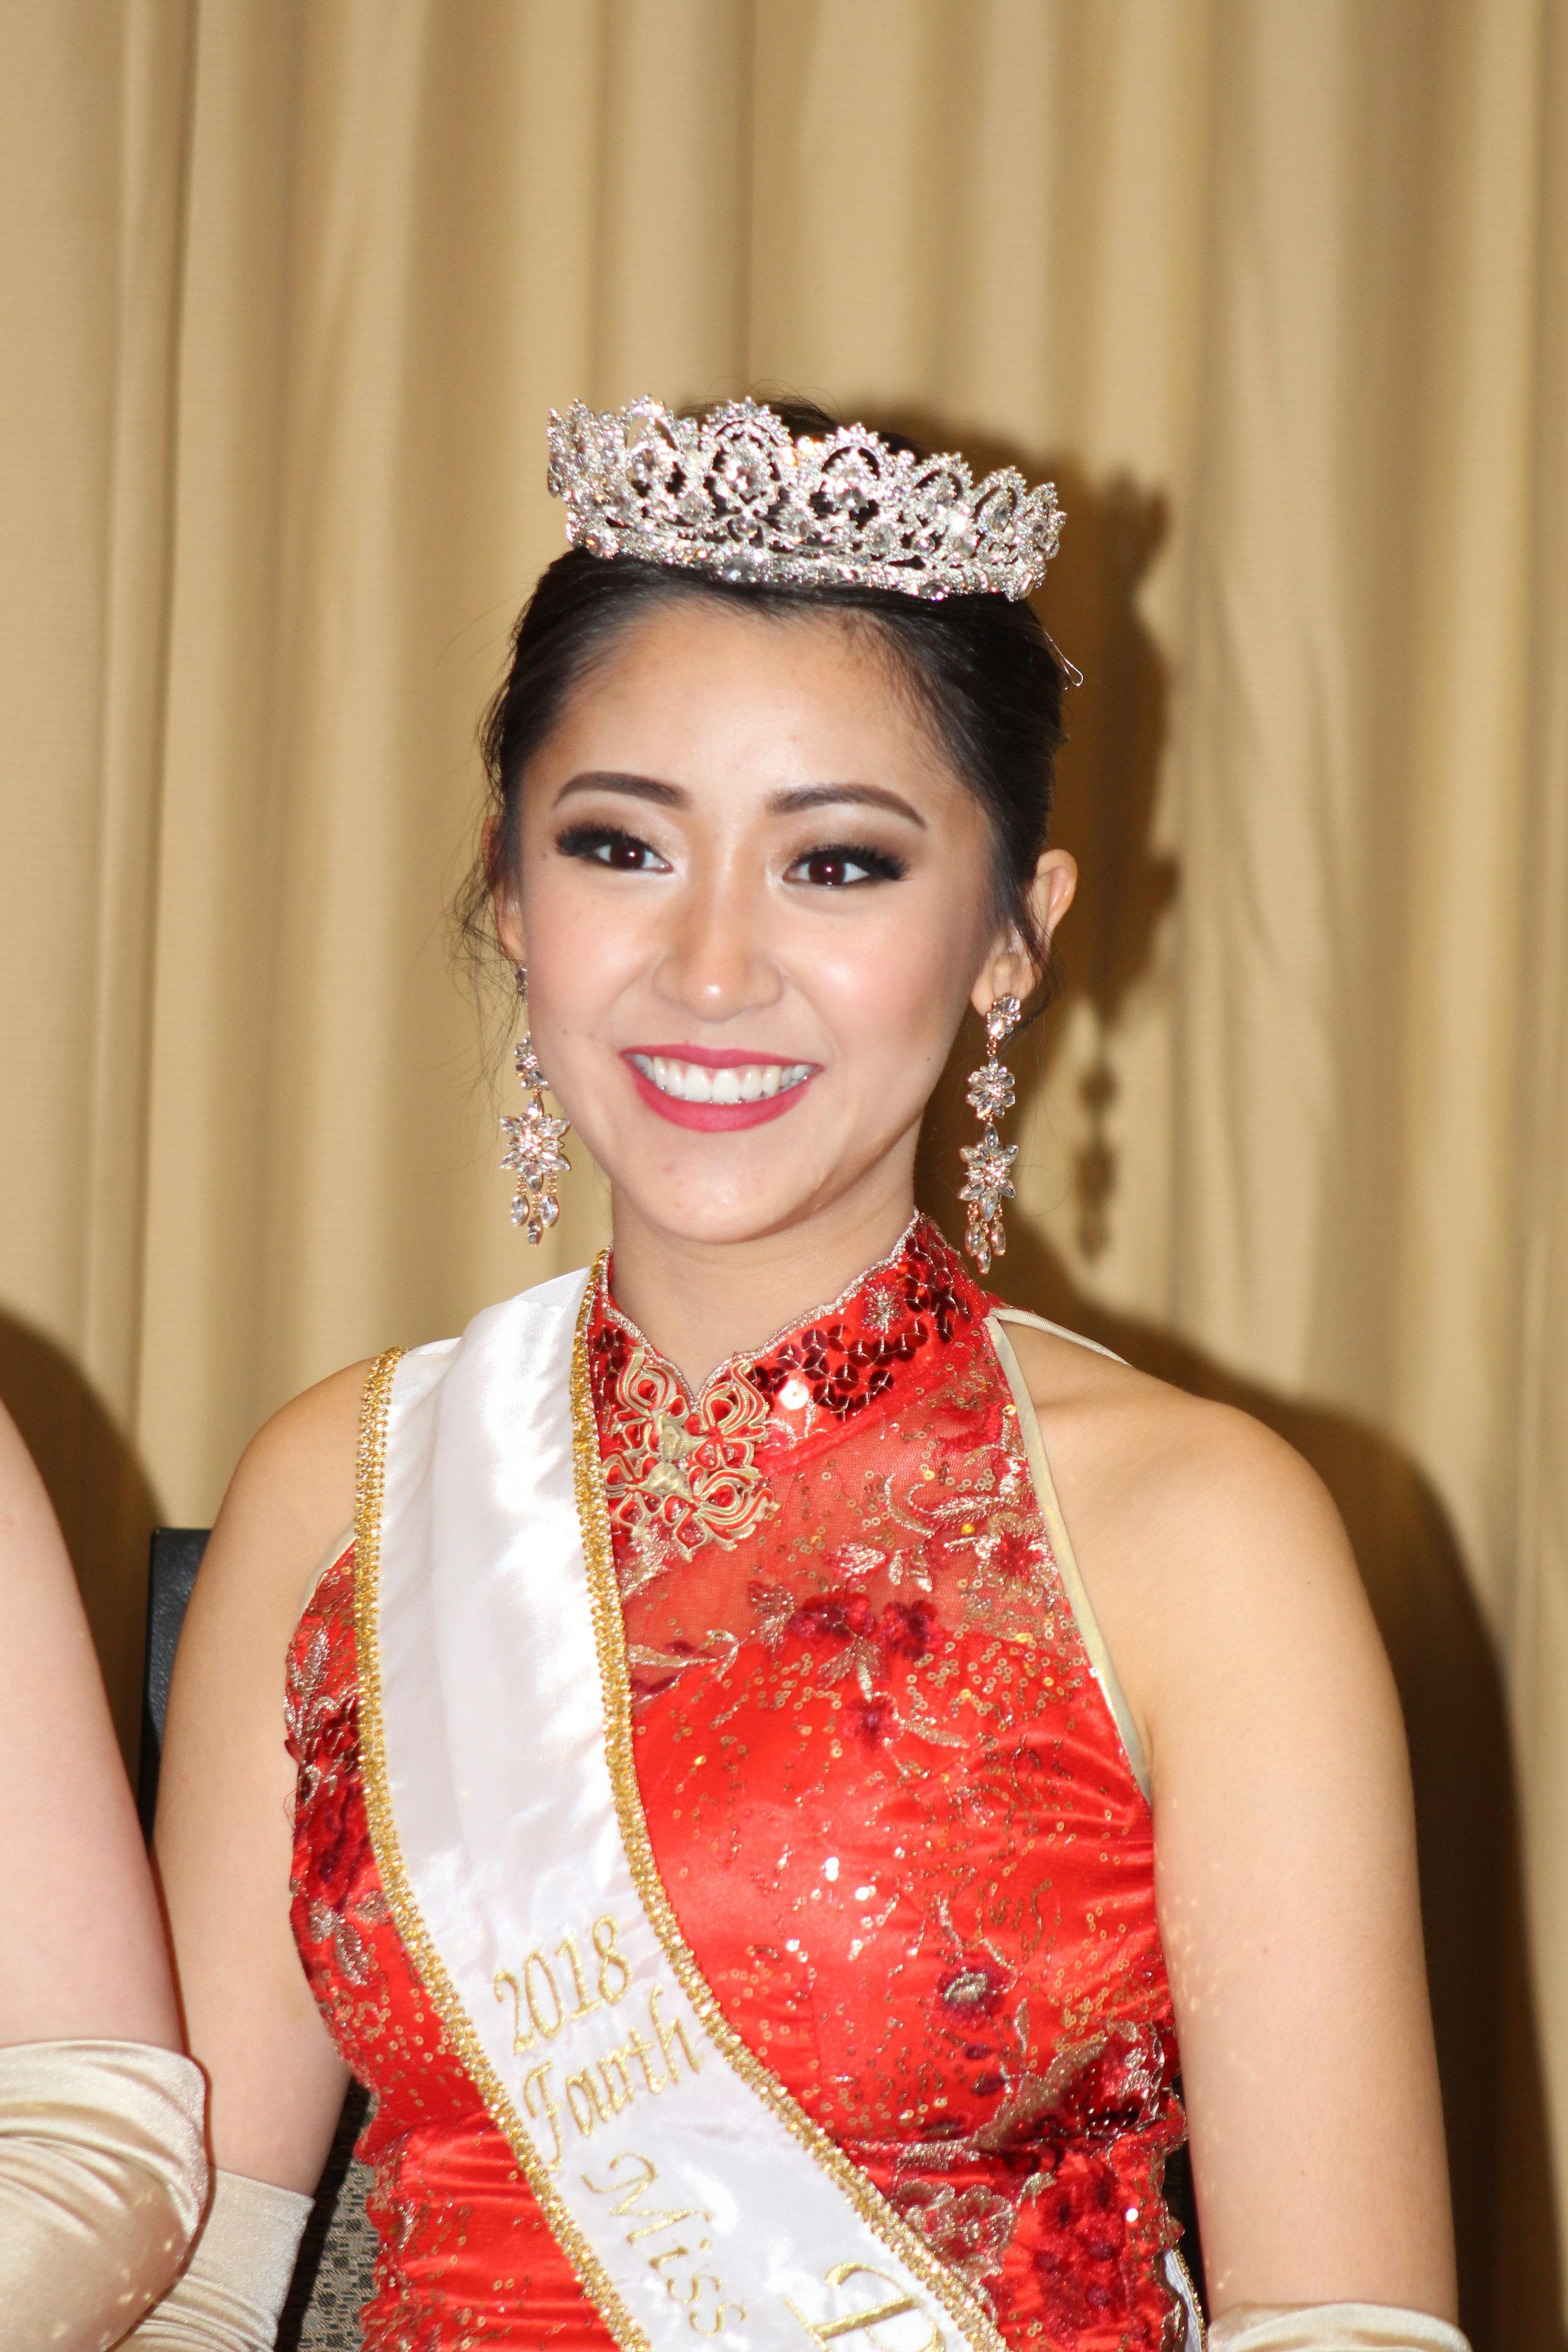 Fourth Princess & Miss Friendship, Anna Wu